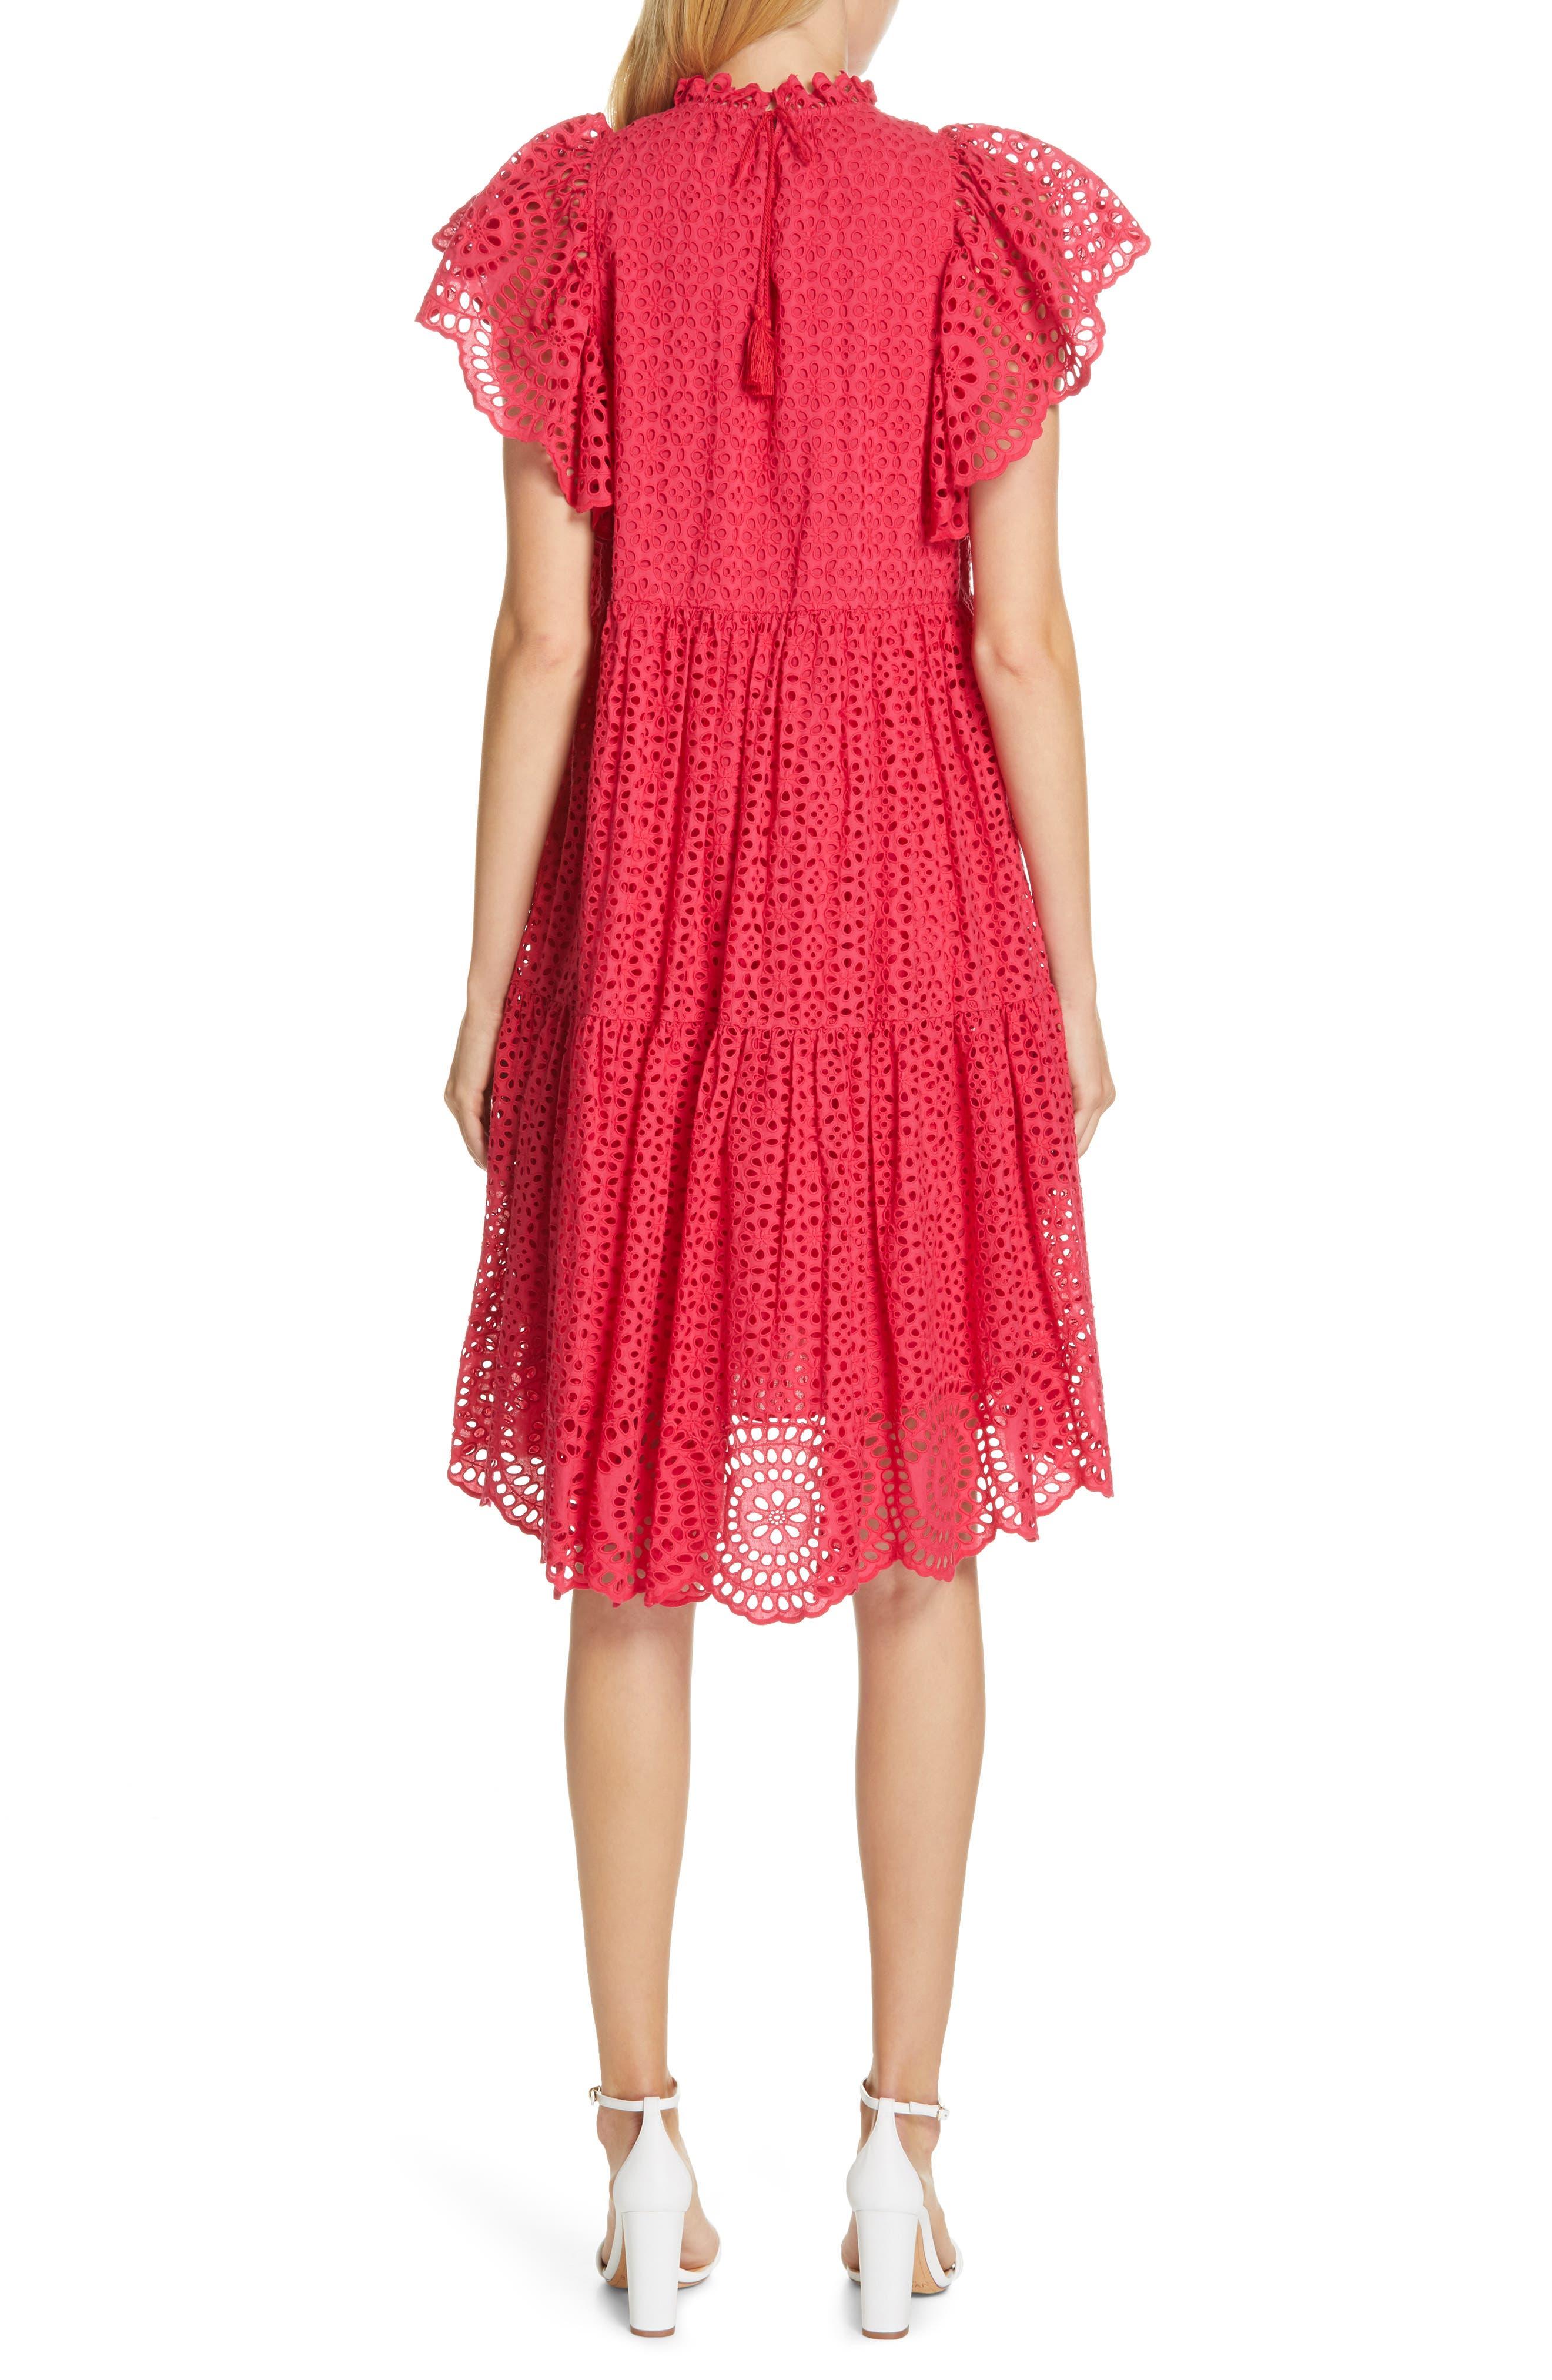 ULLA JOHNSON, Norah Eyelet Dress, Alternate thumbnail 2, color, FUCHSIA